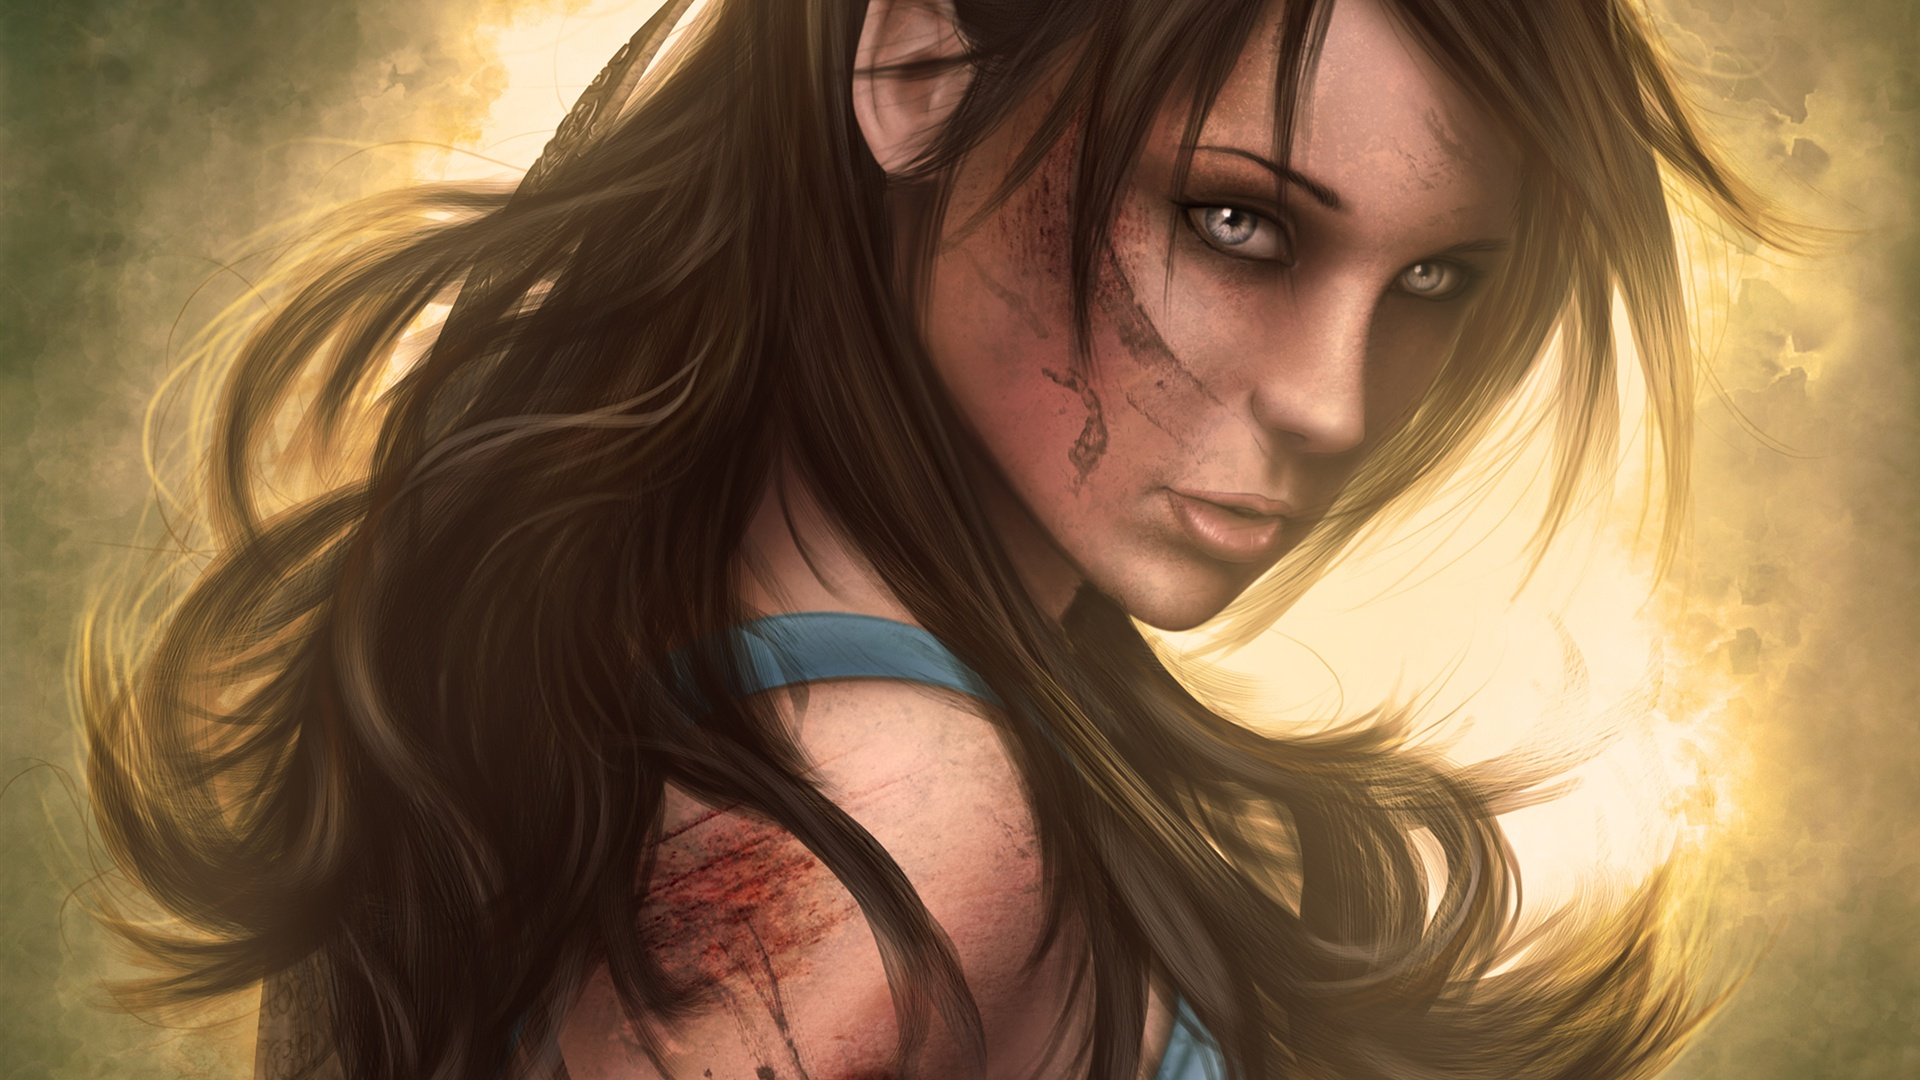 Tomb Raider Lara Croft 2013 Game 1080x1920 Iphone 8 7 6 6s